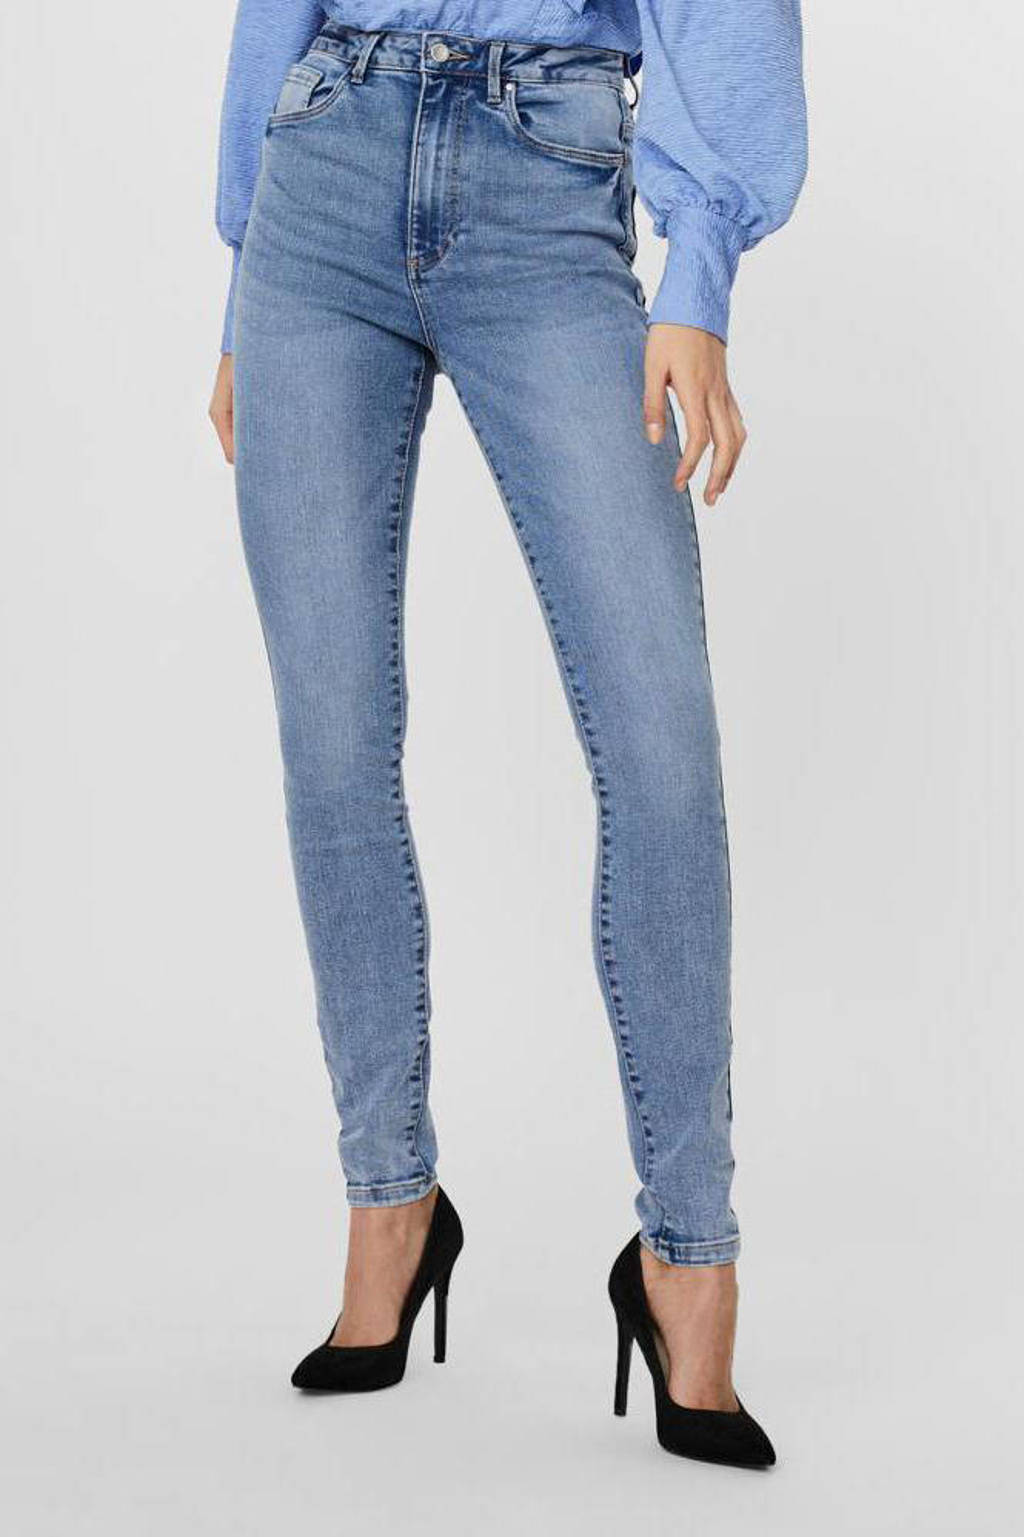 VERO MODA high waist skinny jeans VMLOA met biologisch katoen light denim, Light denim